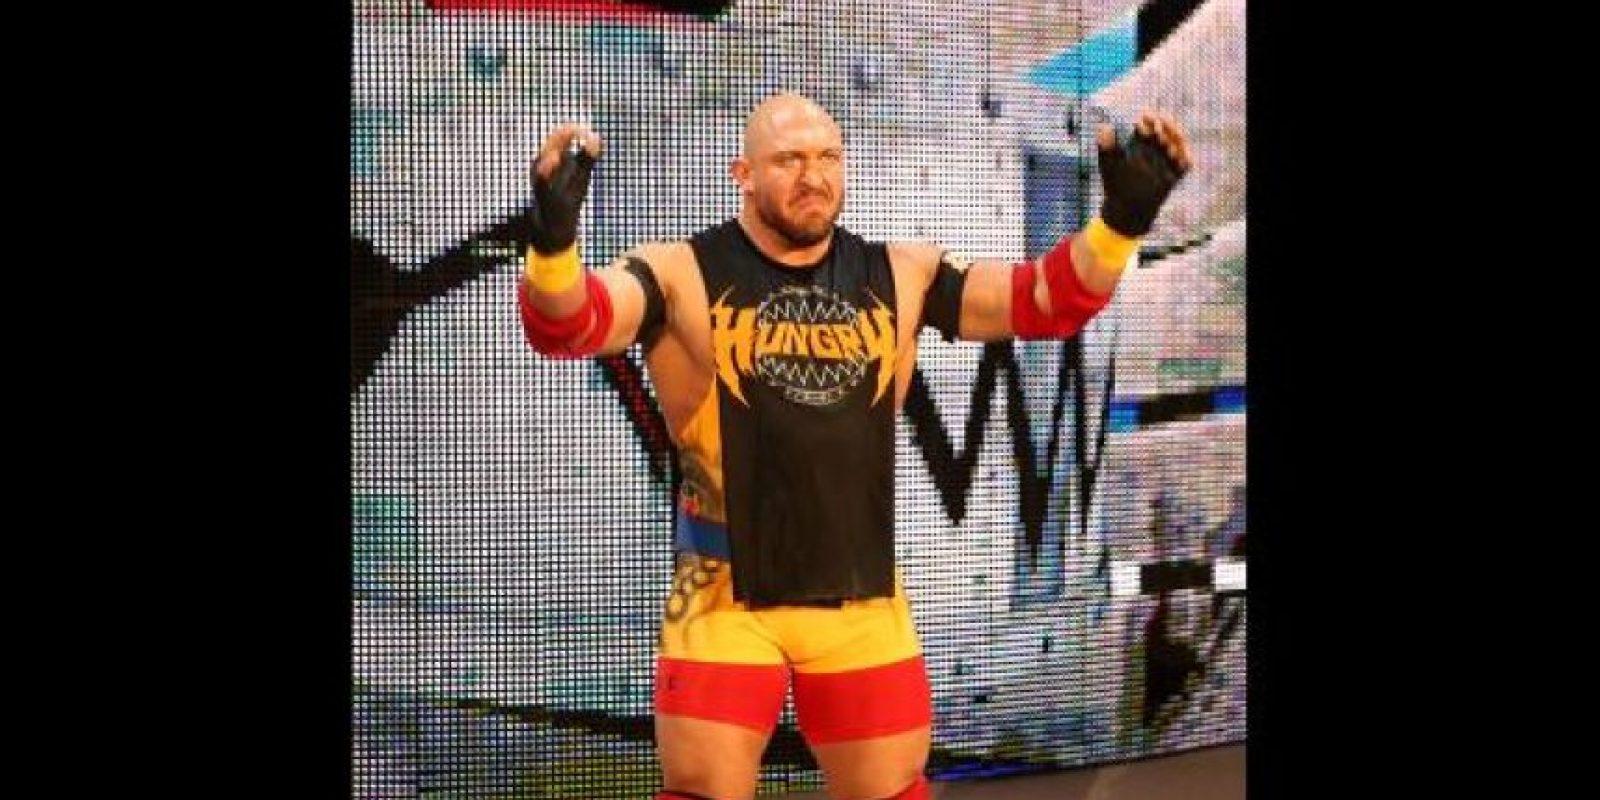 Le pasó por encima a Ryback Foto:WWE